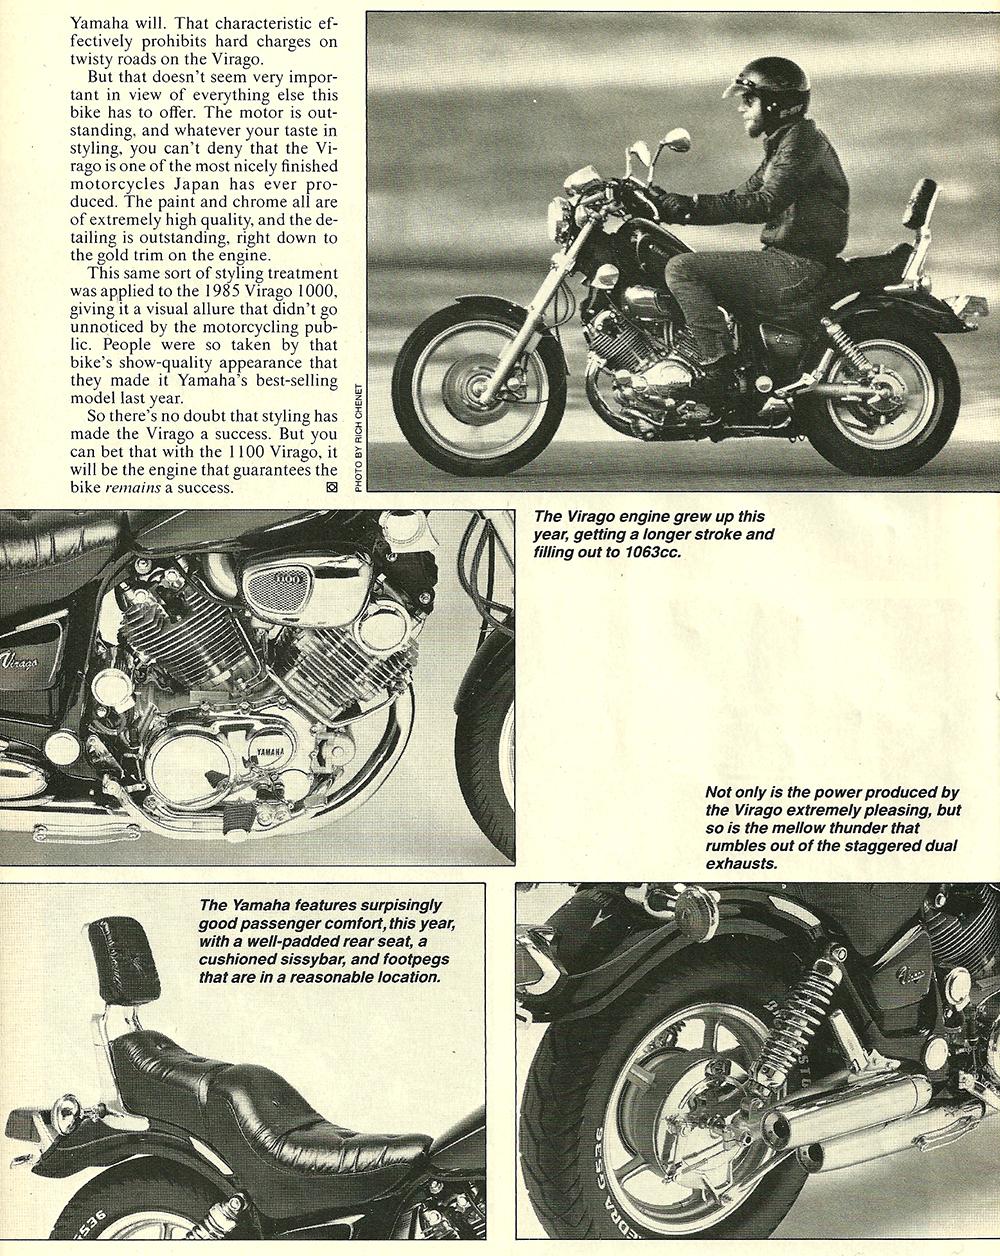 1986 Yamaha Virago 1100 road test 03.jpg